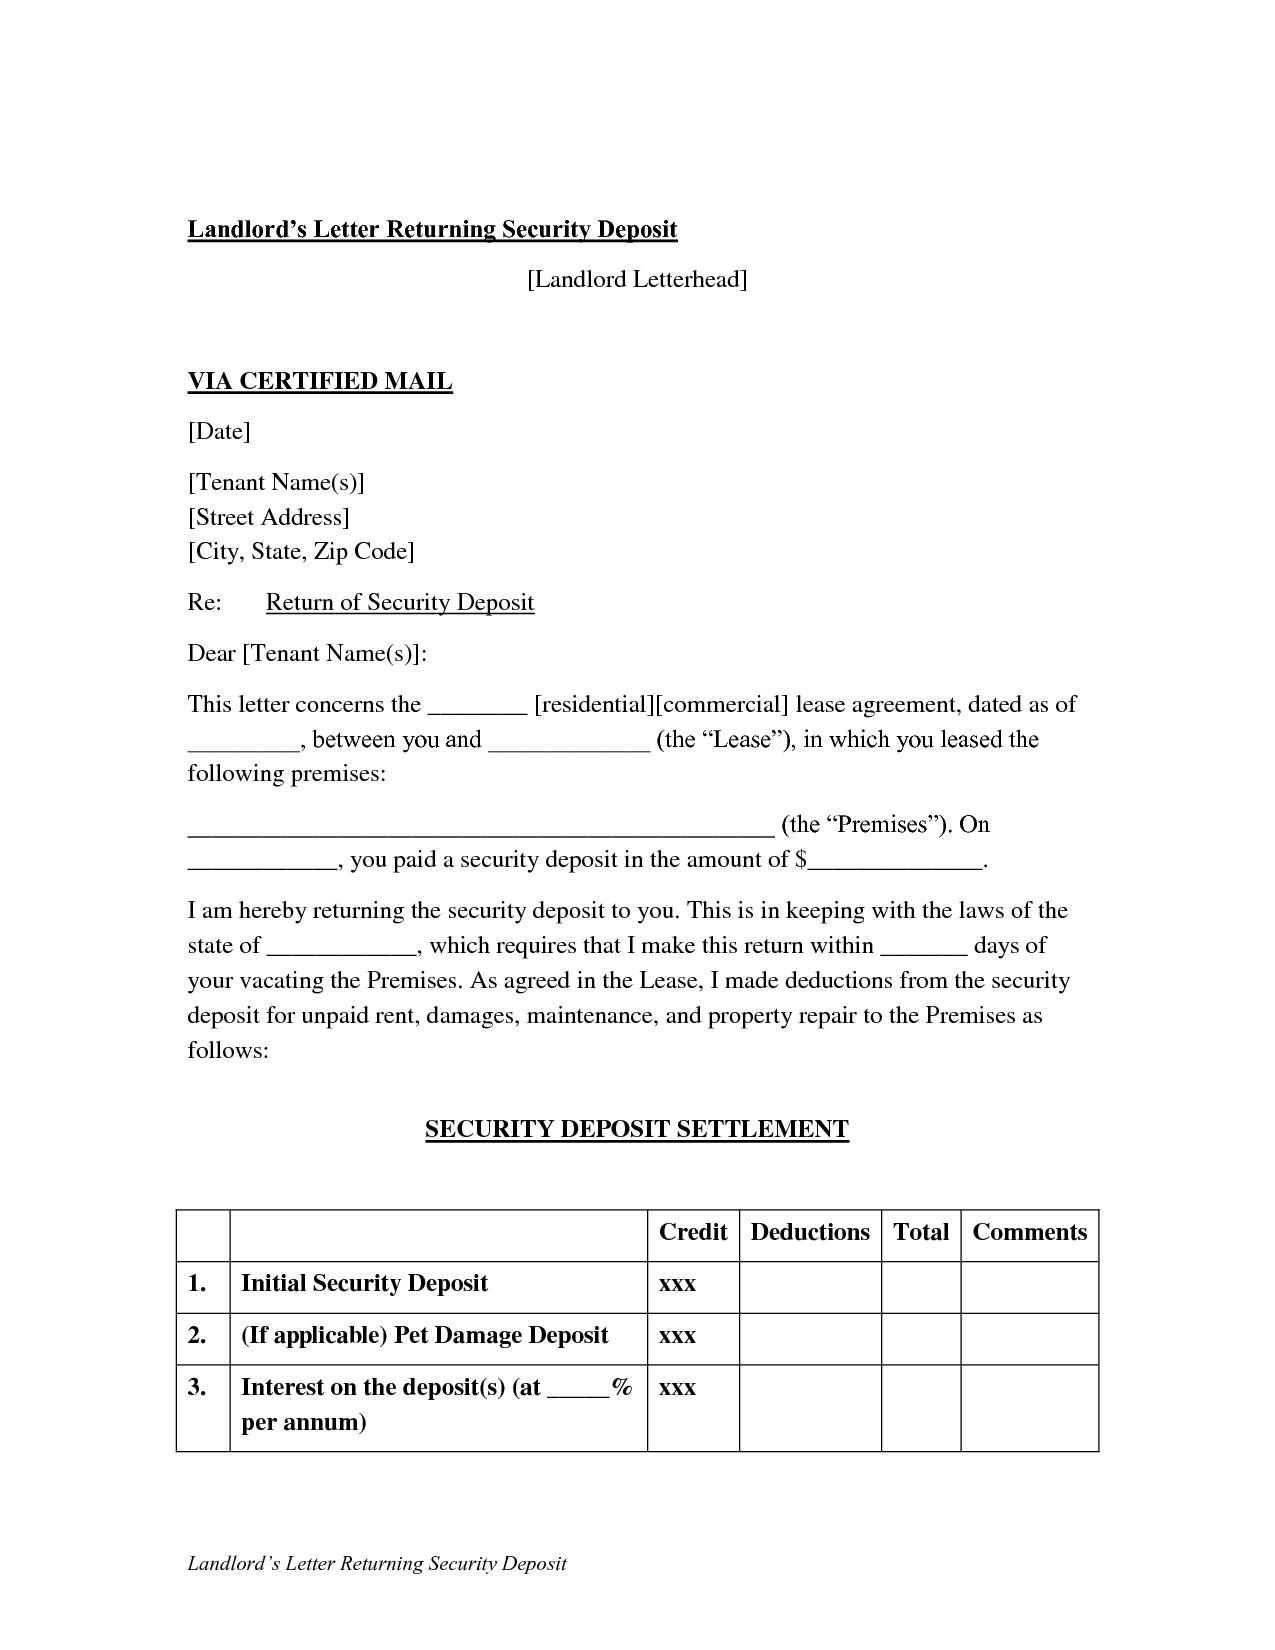 security deposit refund letter template sample security deposit refund letter